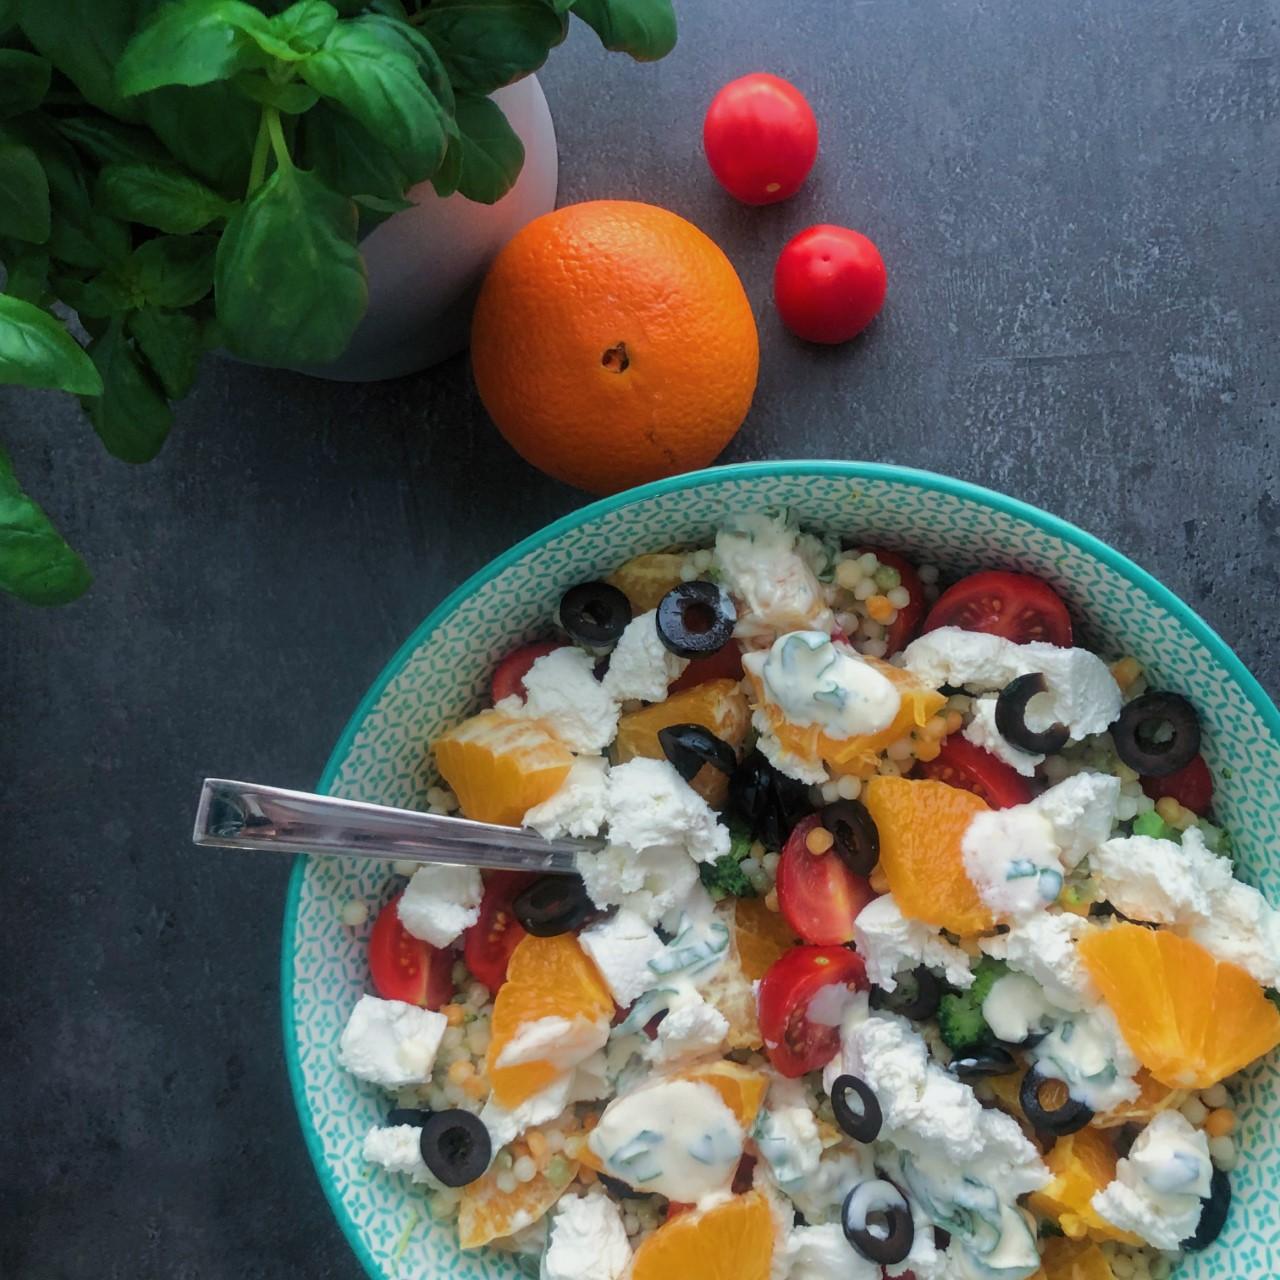 Parelcouscous salade met geitenkaas en sinaasappel